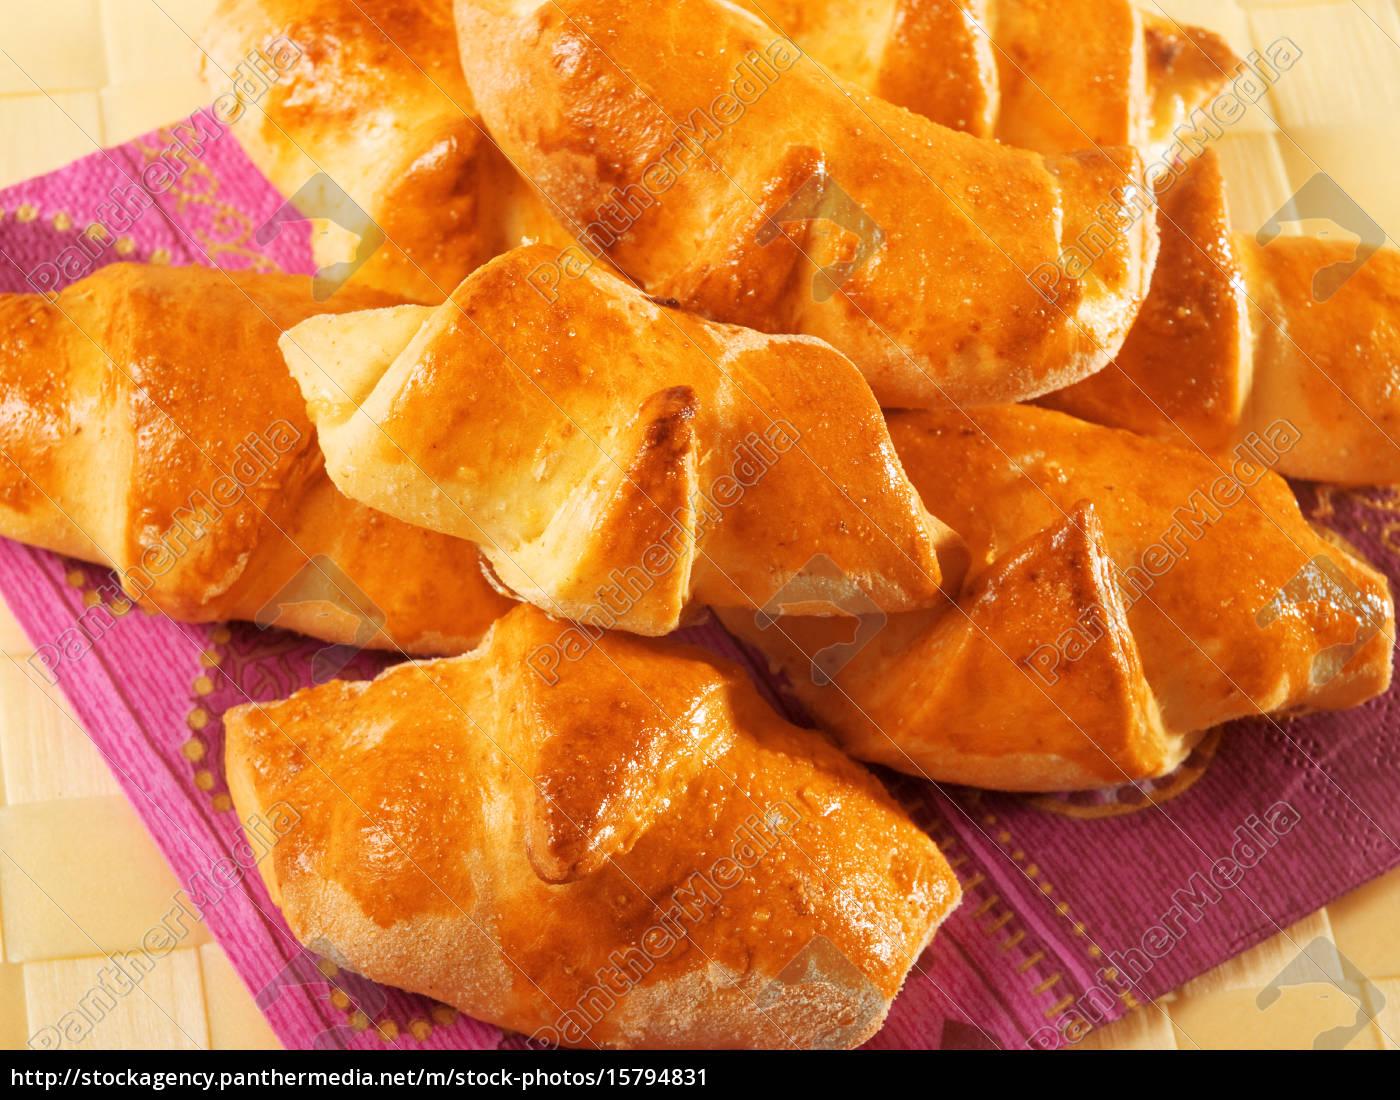 homemade, croissants, homemade, croissants, homemade, croissants, homemade, croissants - 15794831